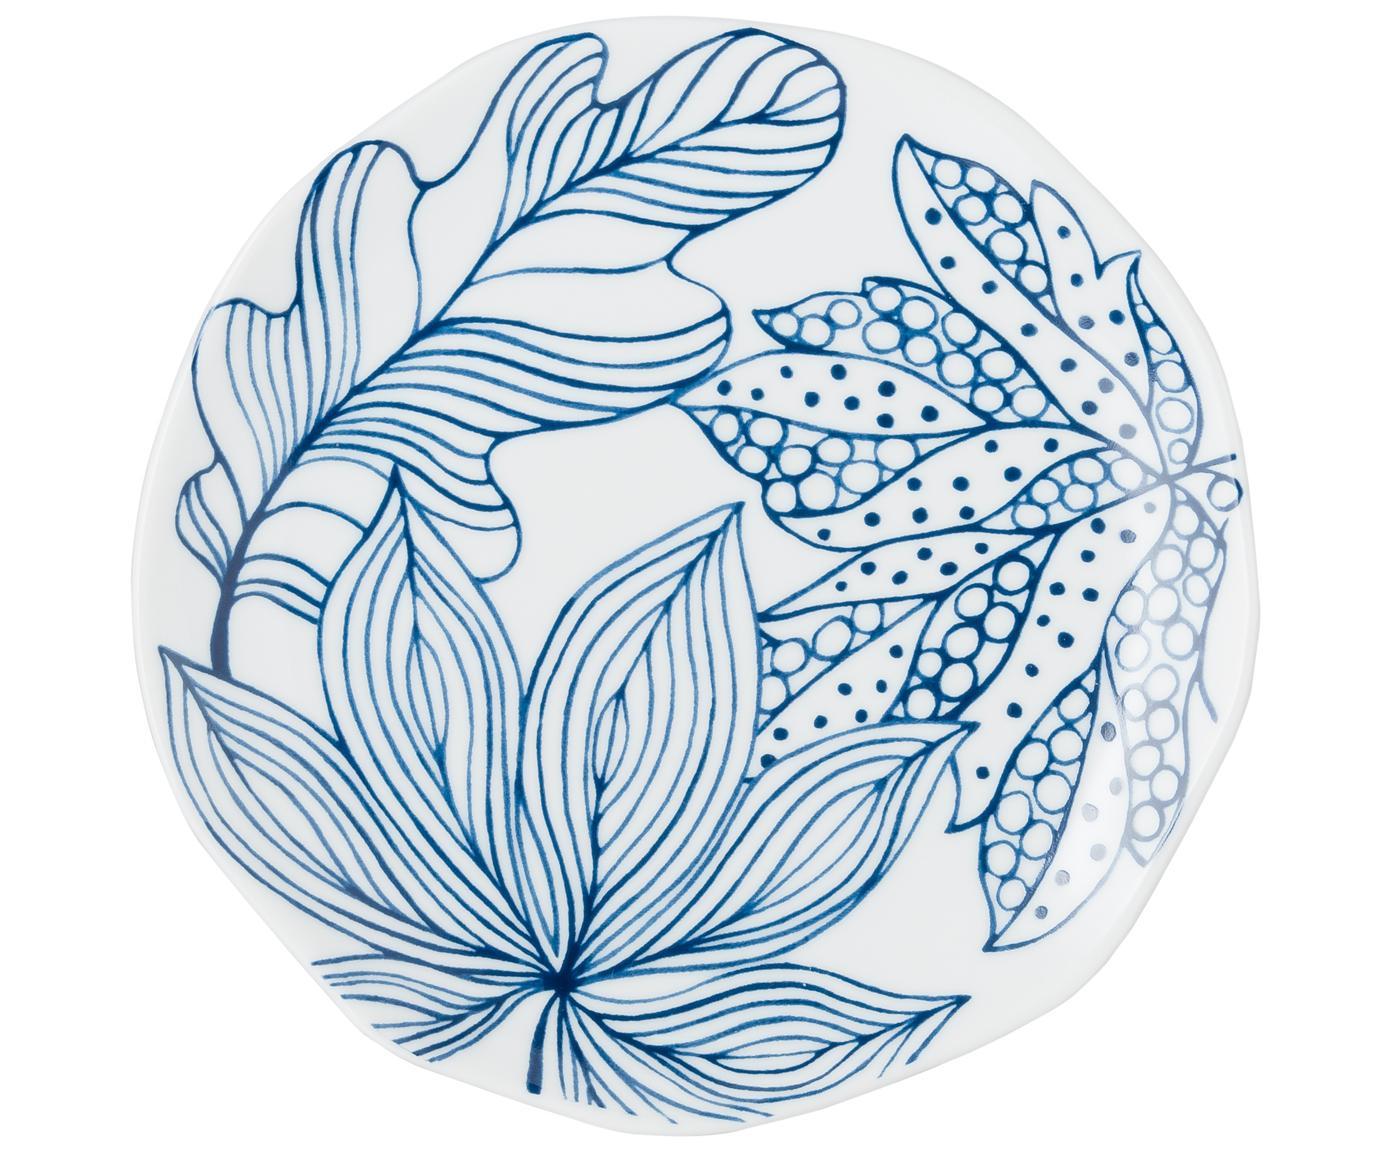 Set 6 piattini da dessert bianco/blu Vassoio, Porcellana, Blu, bianco, Ø 20 cm